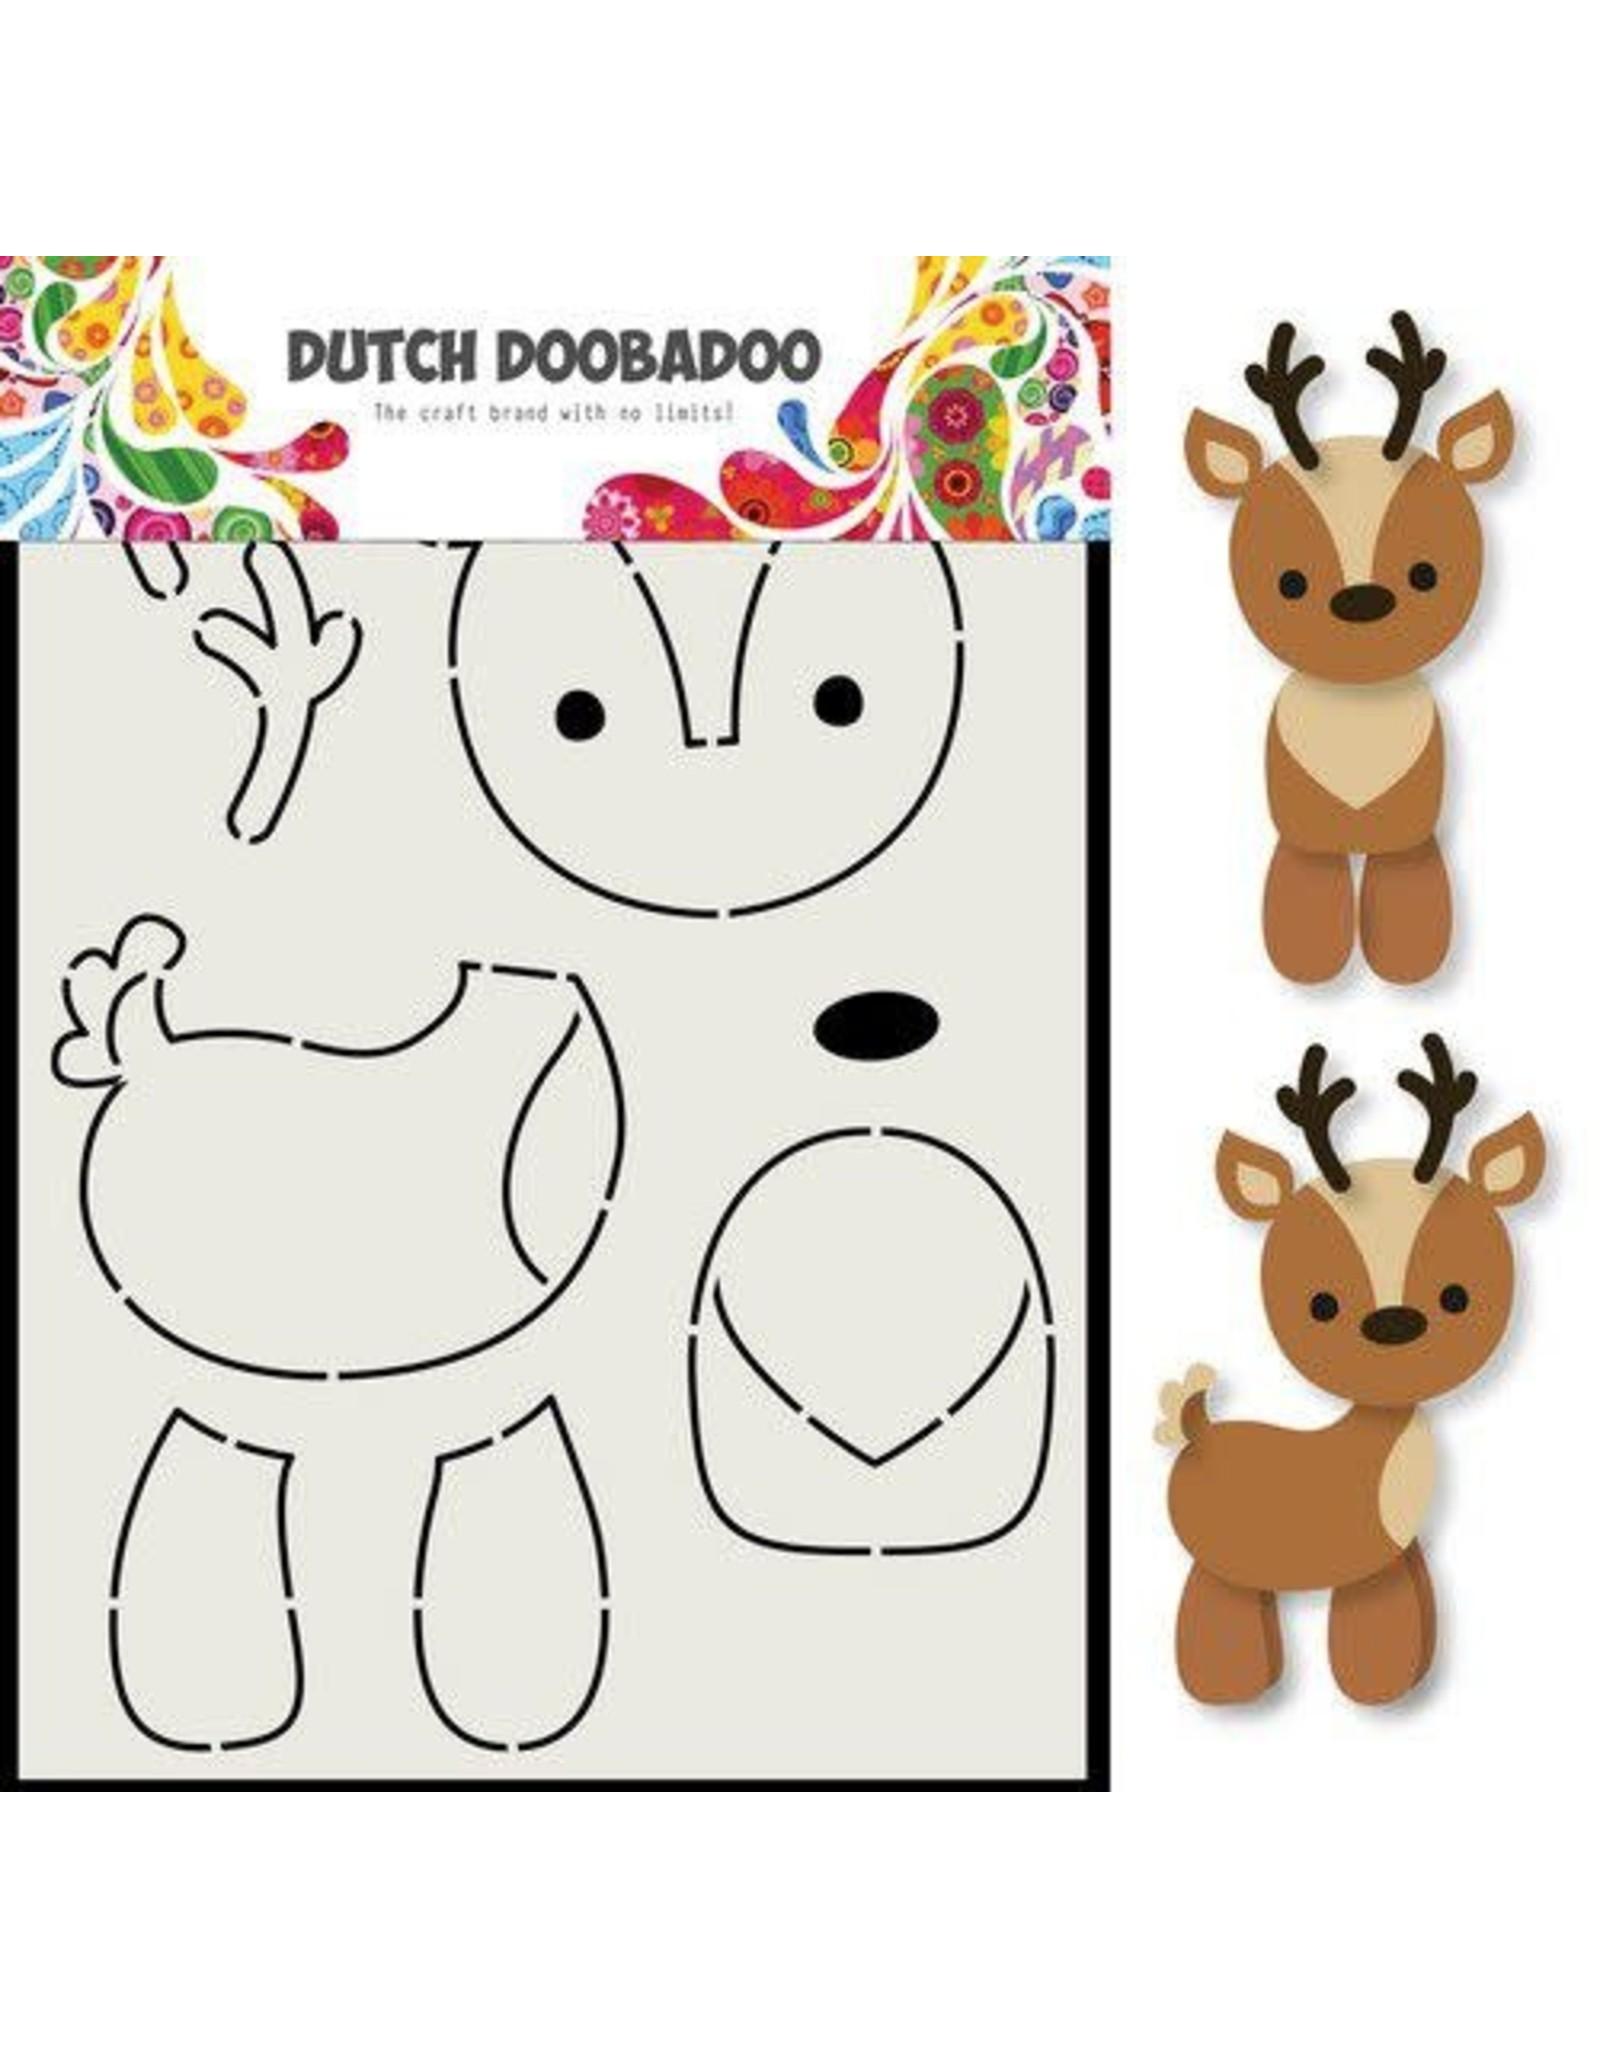 Dutch Doobadoo Dutch Doobadoo Card Art Rendier A5 470.713.796